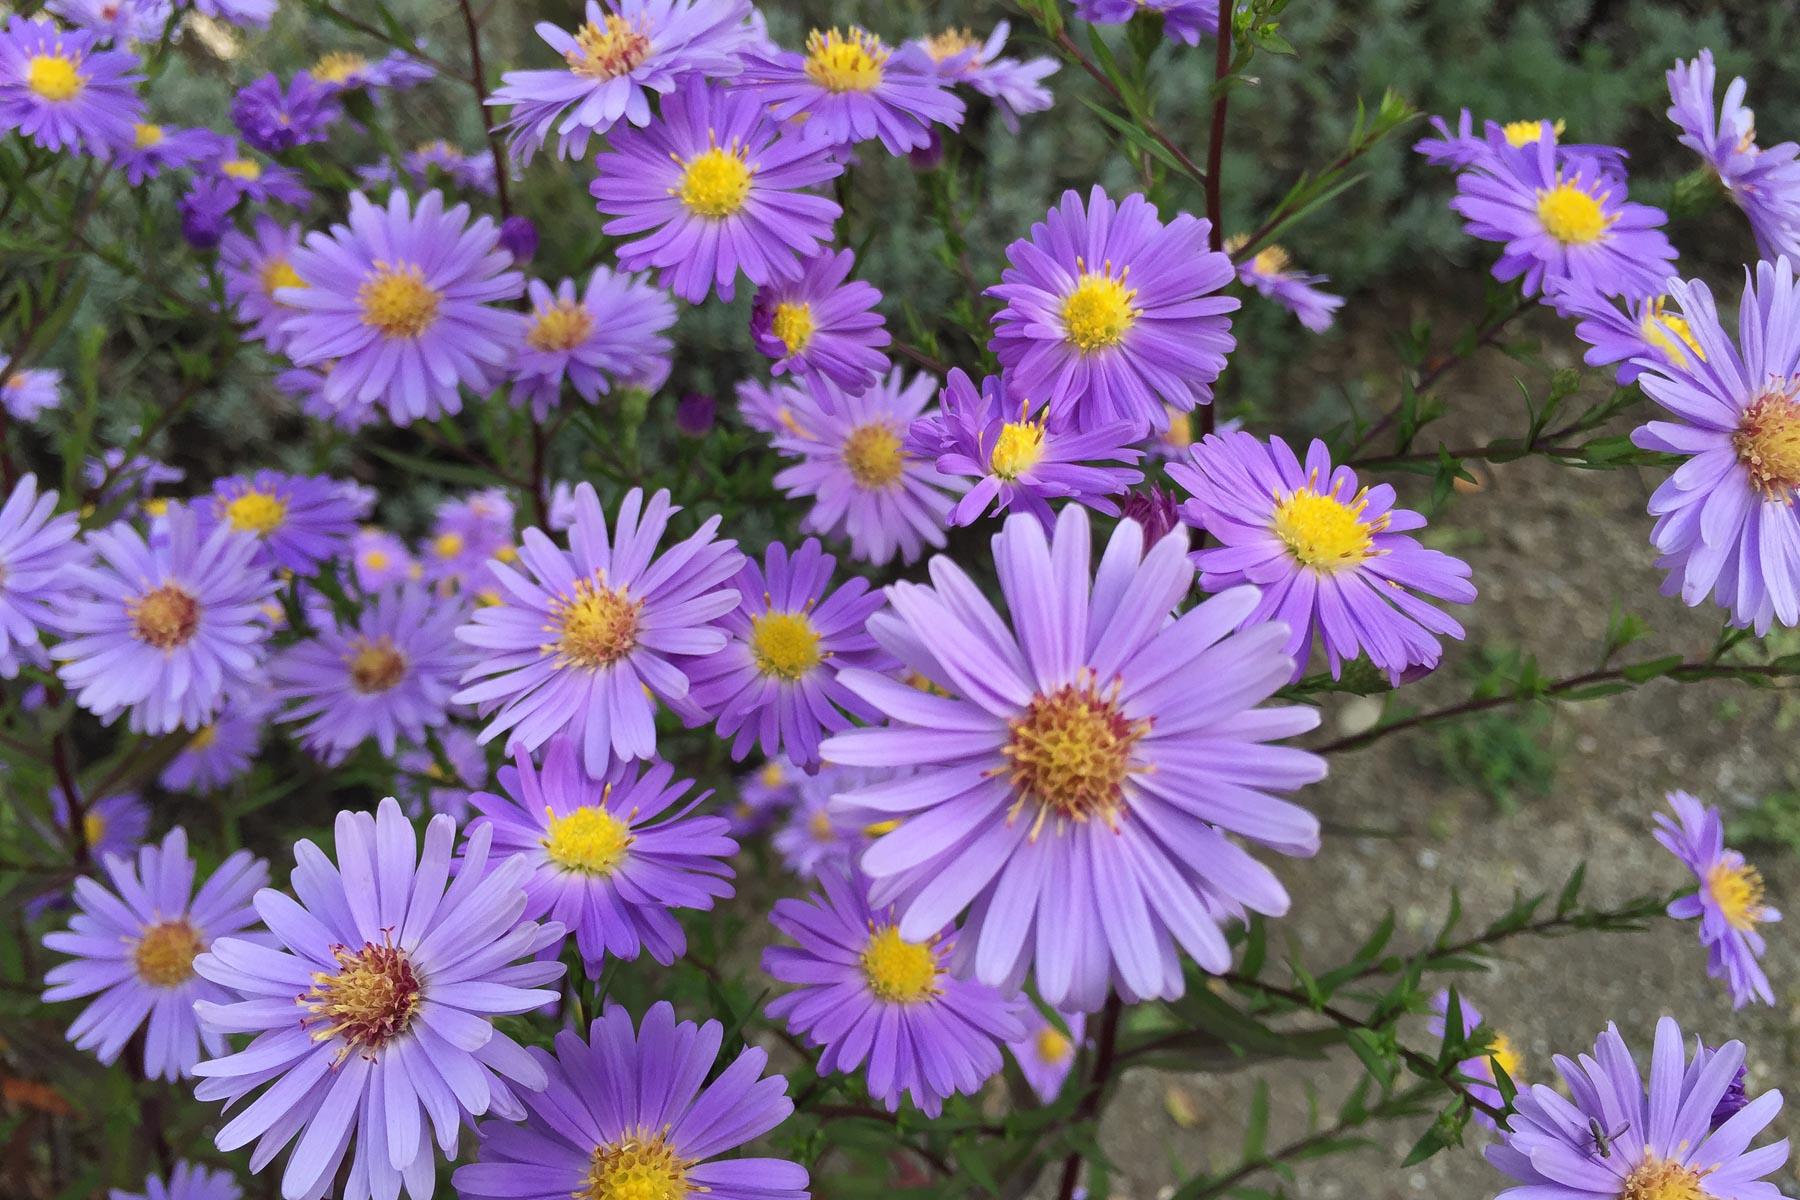 Aster in Lavendelblau